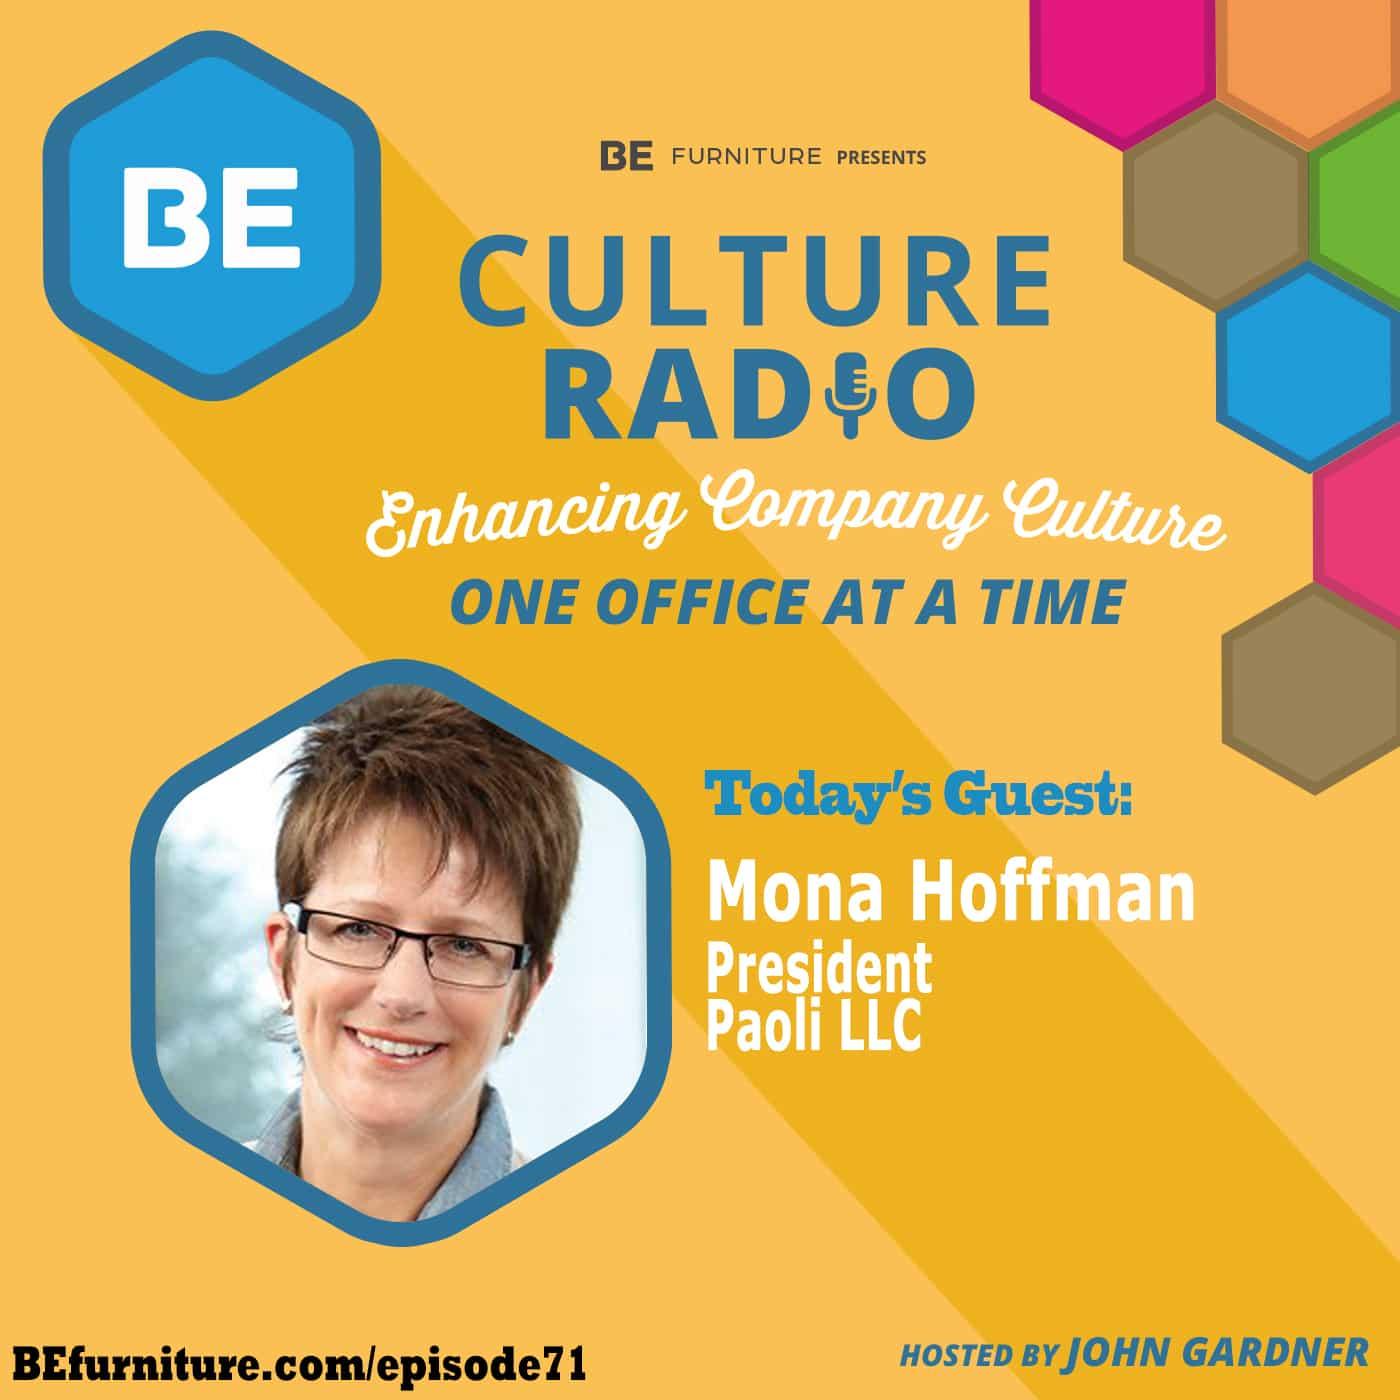 Mona Hoffman - President , Paoli LLC